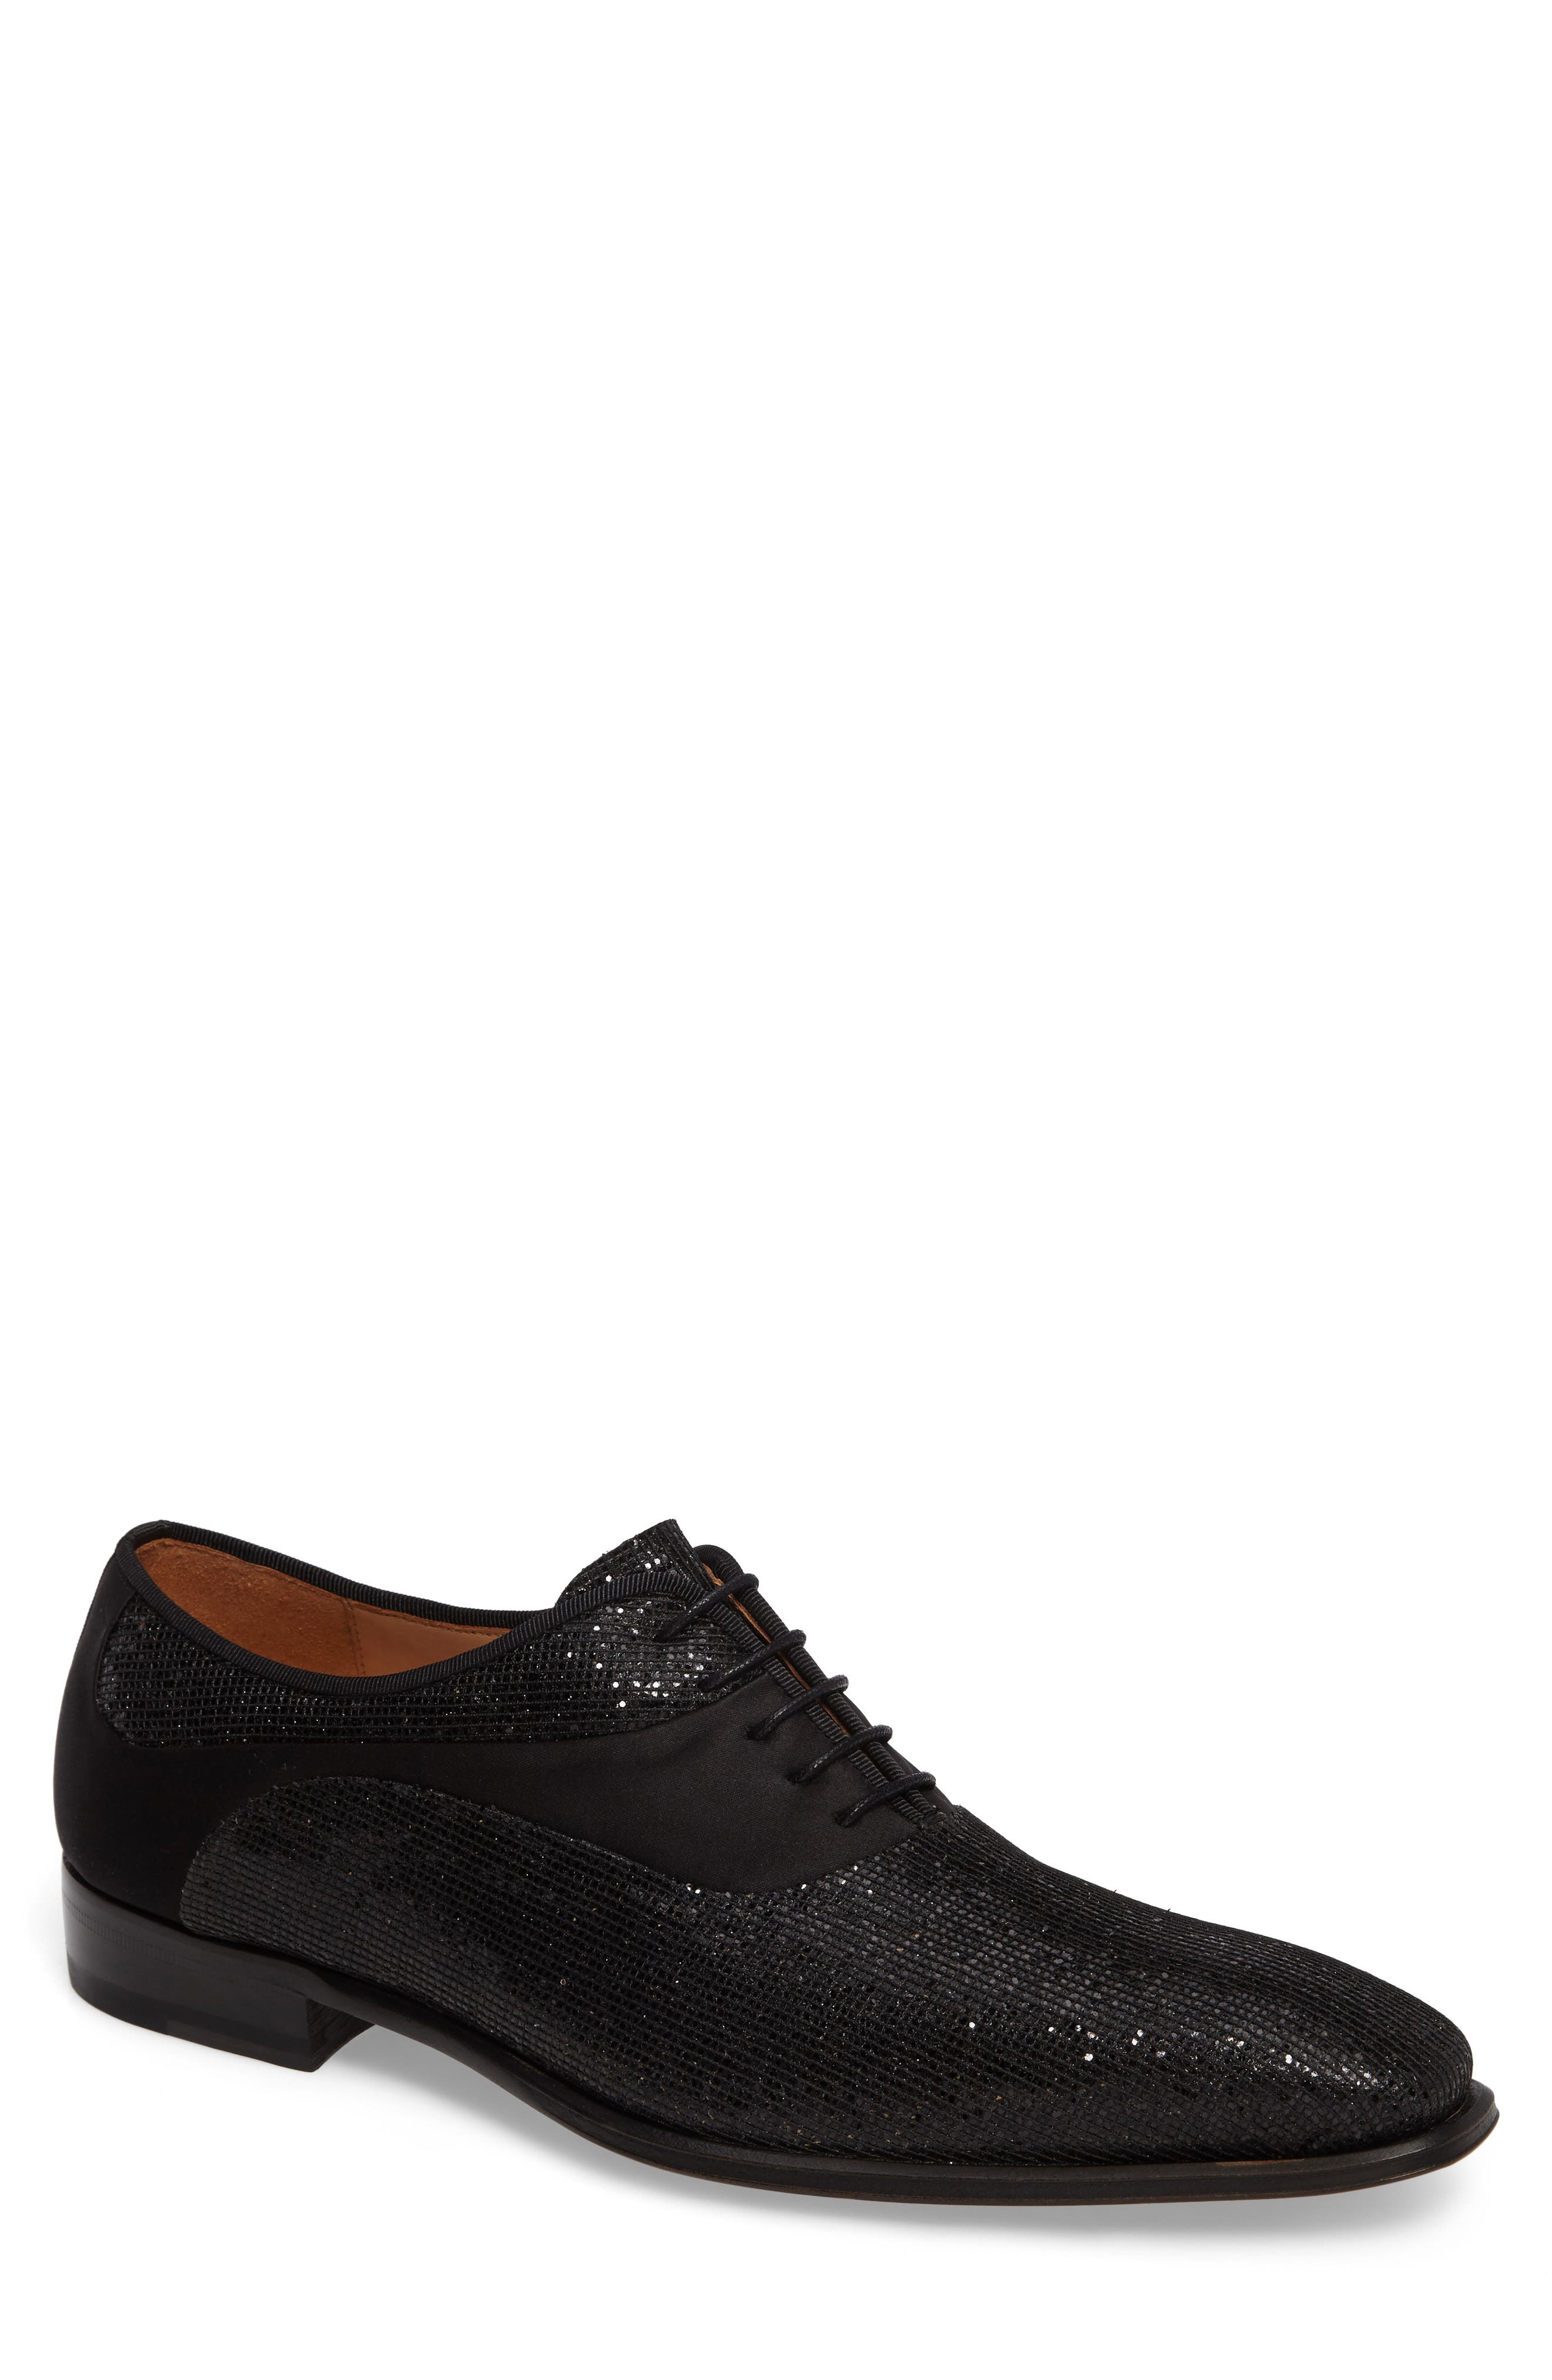 Honore Plain Toe Oxford,                         Main,                         color, Black Suede